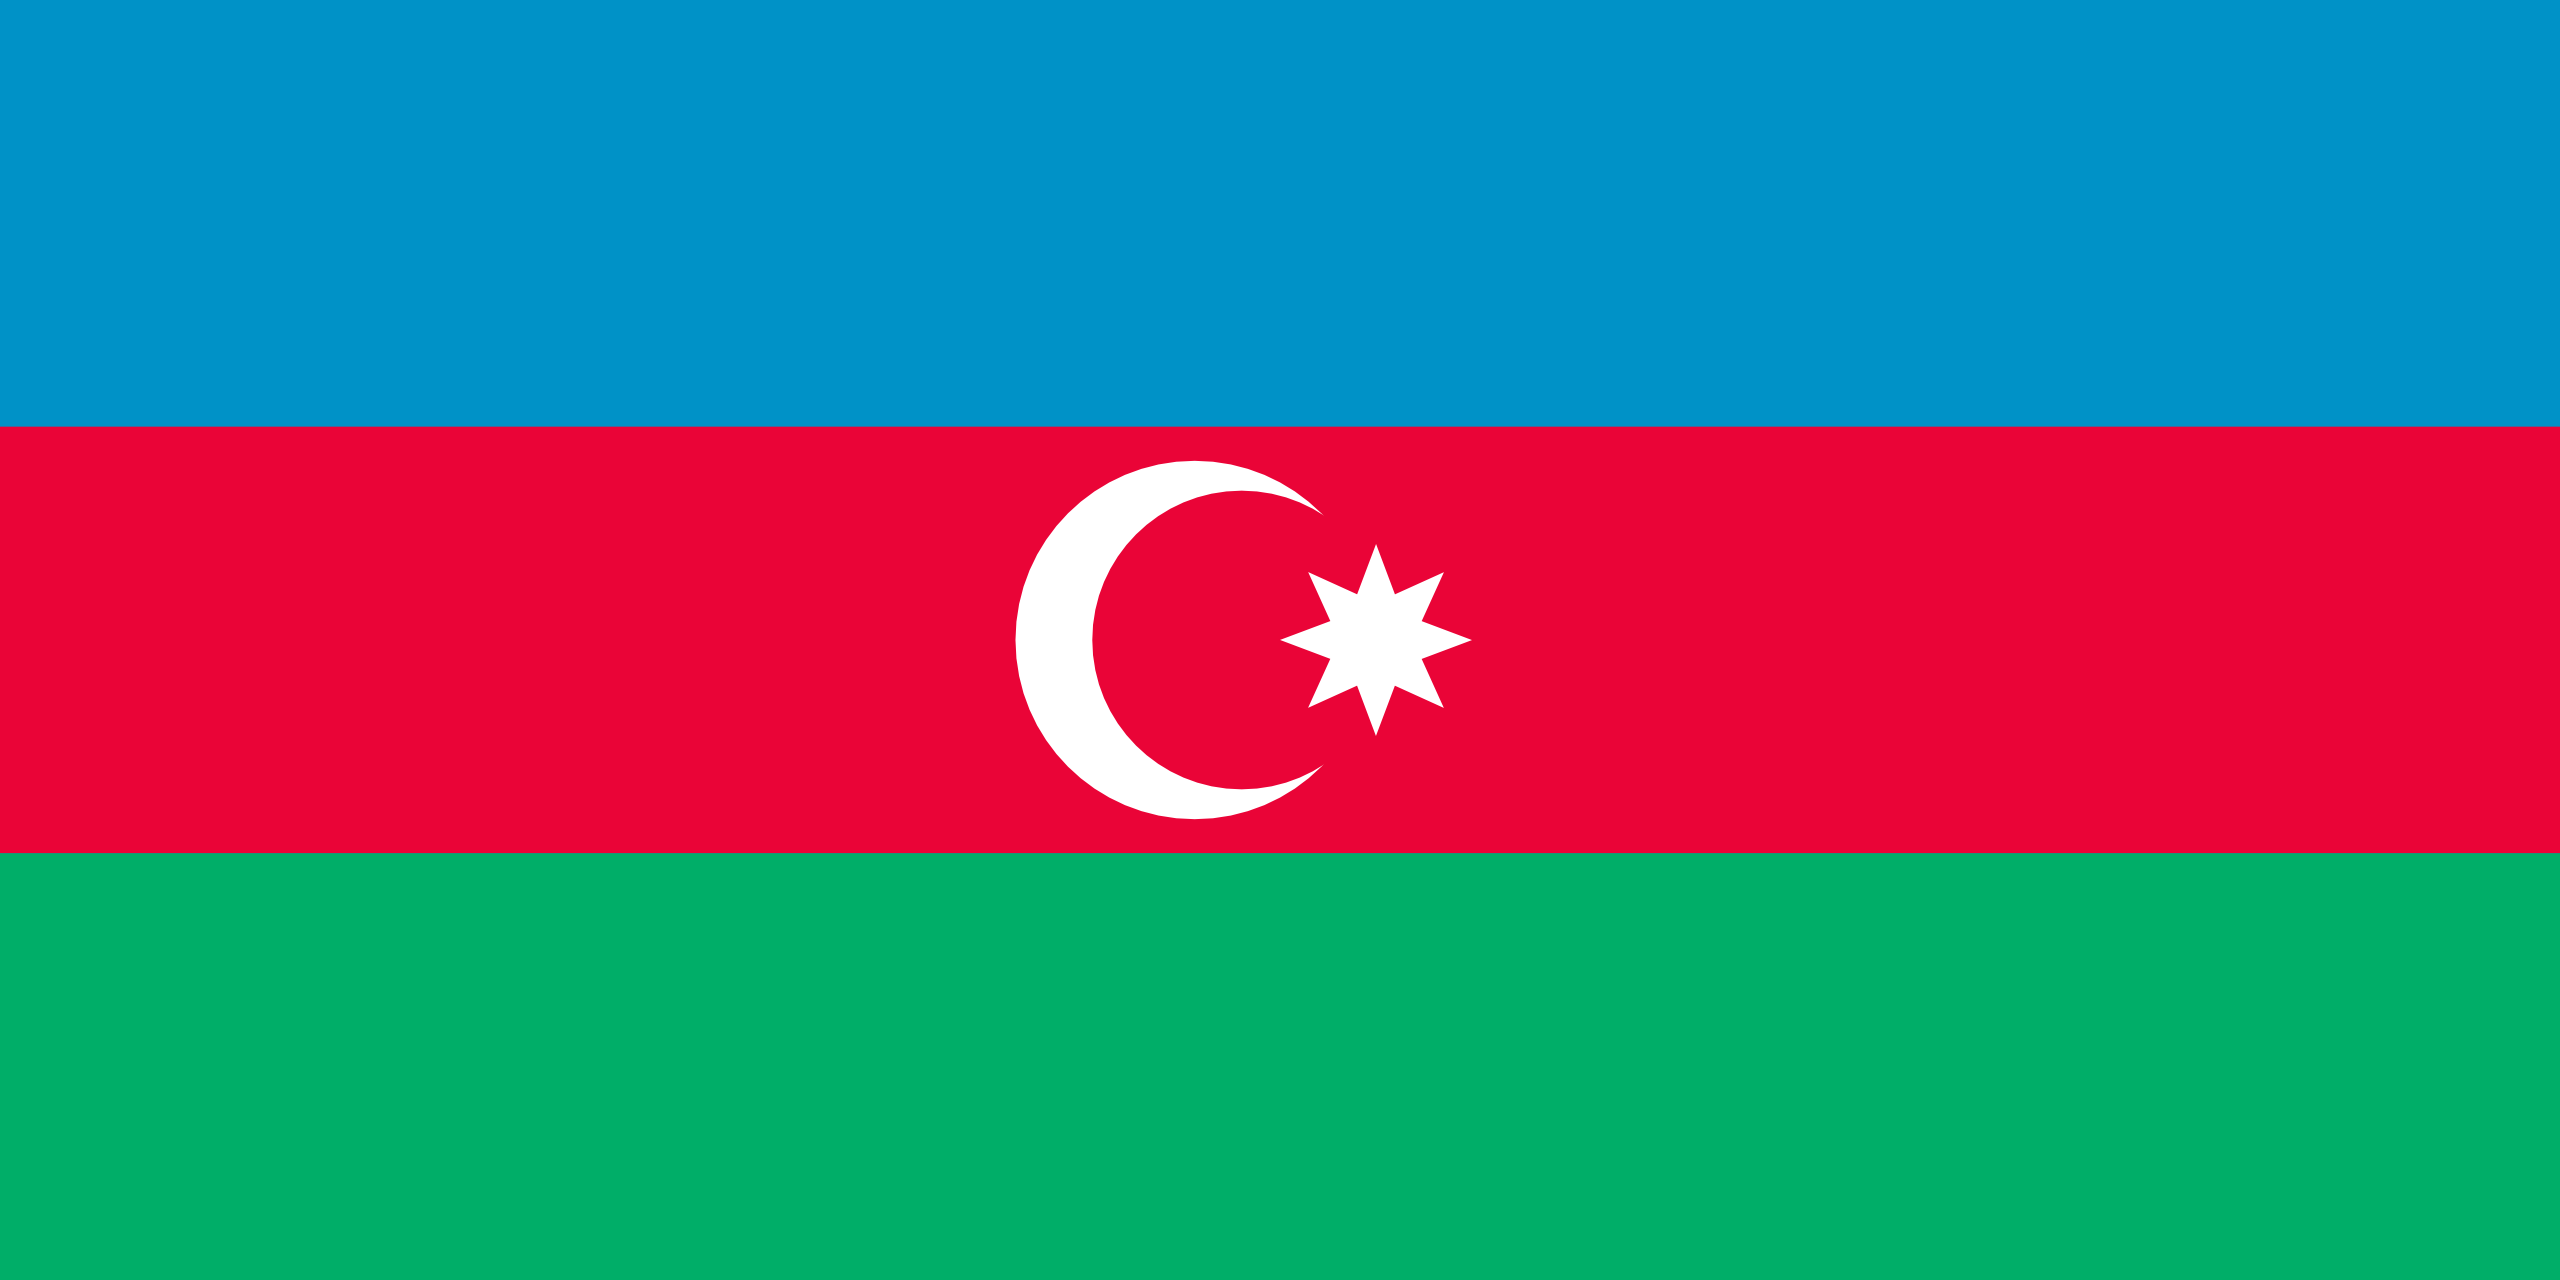 azerbaiyán, 国家, 会徽, 徽标, 符号 - 高清壁纸 - 教授-falken.com